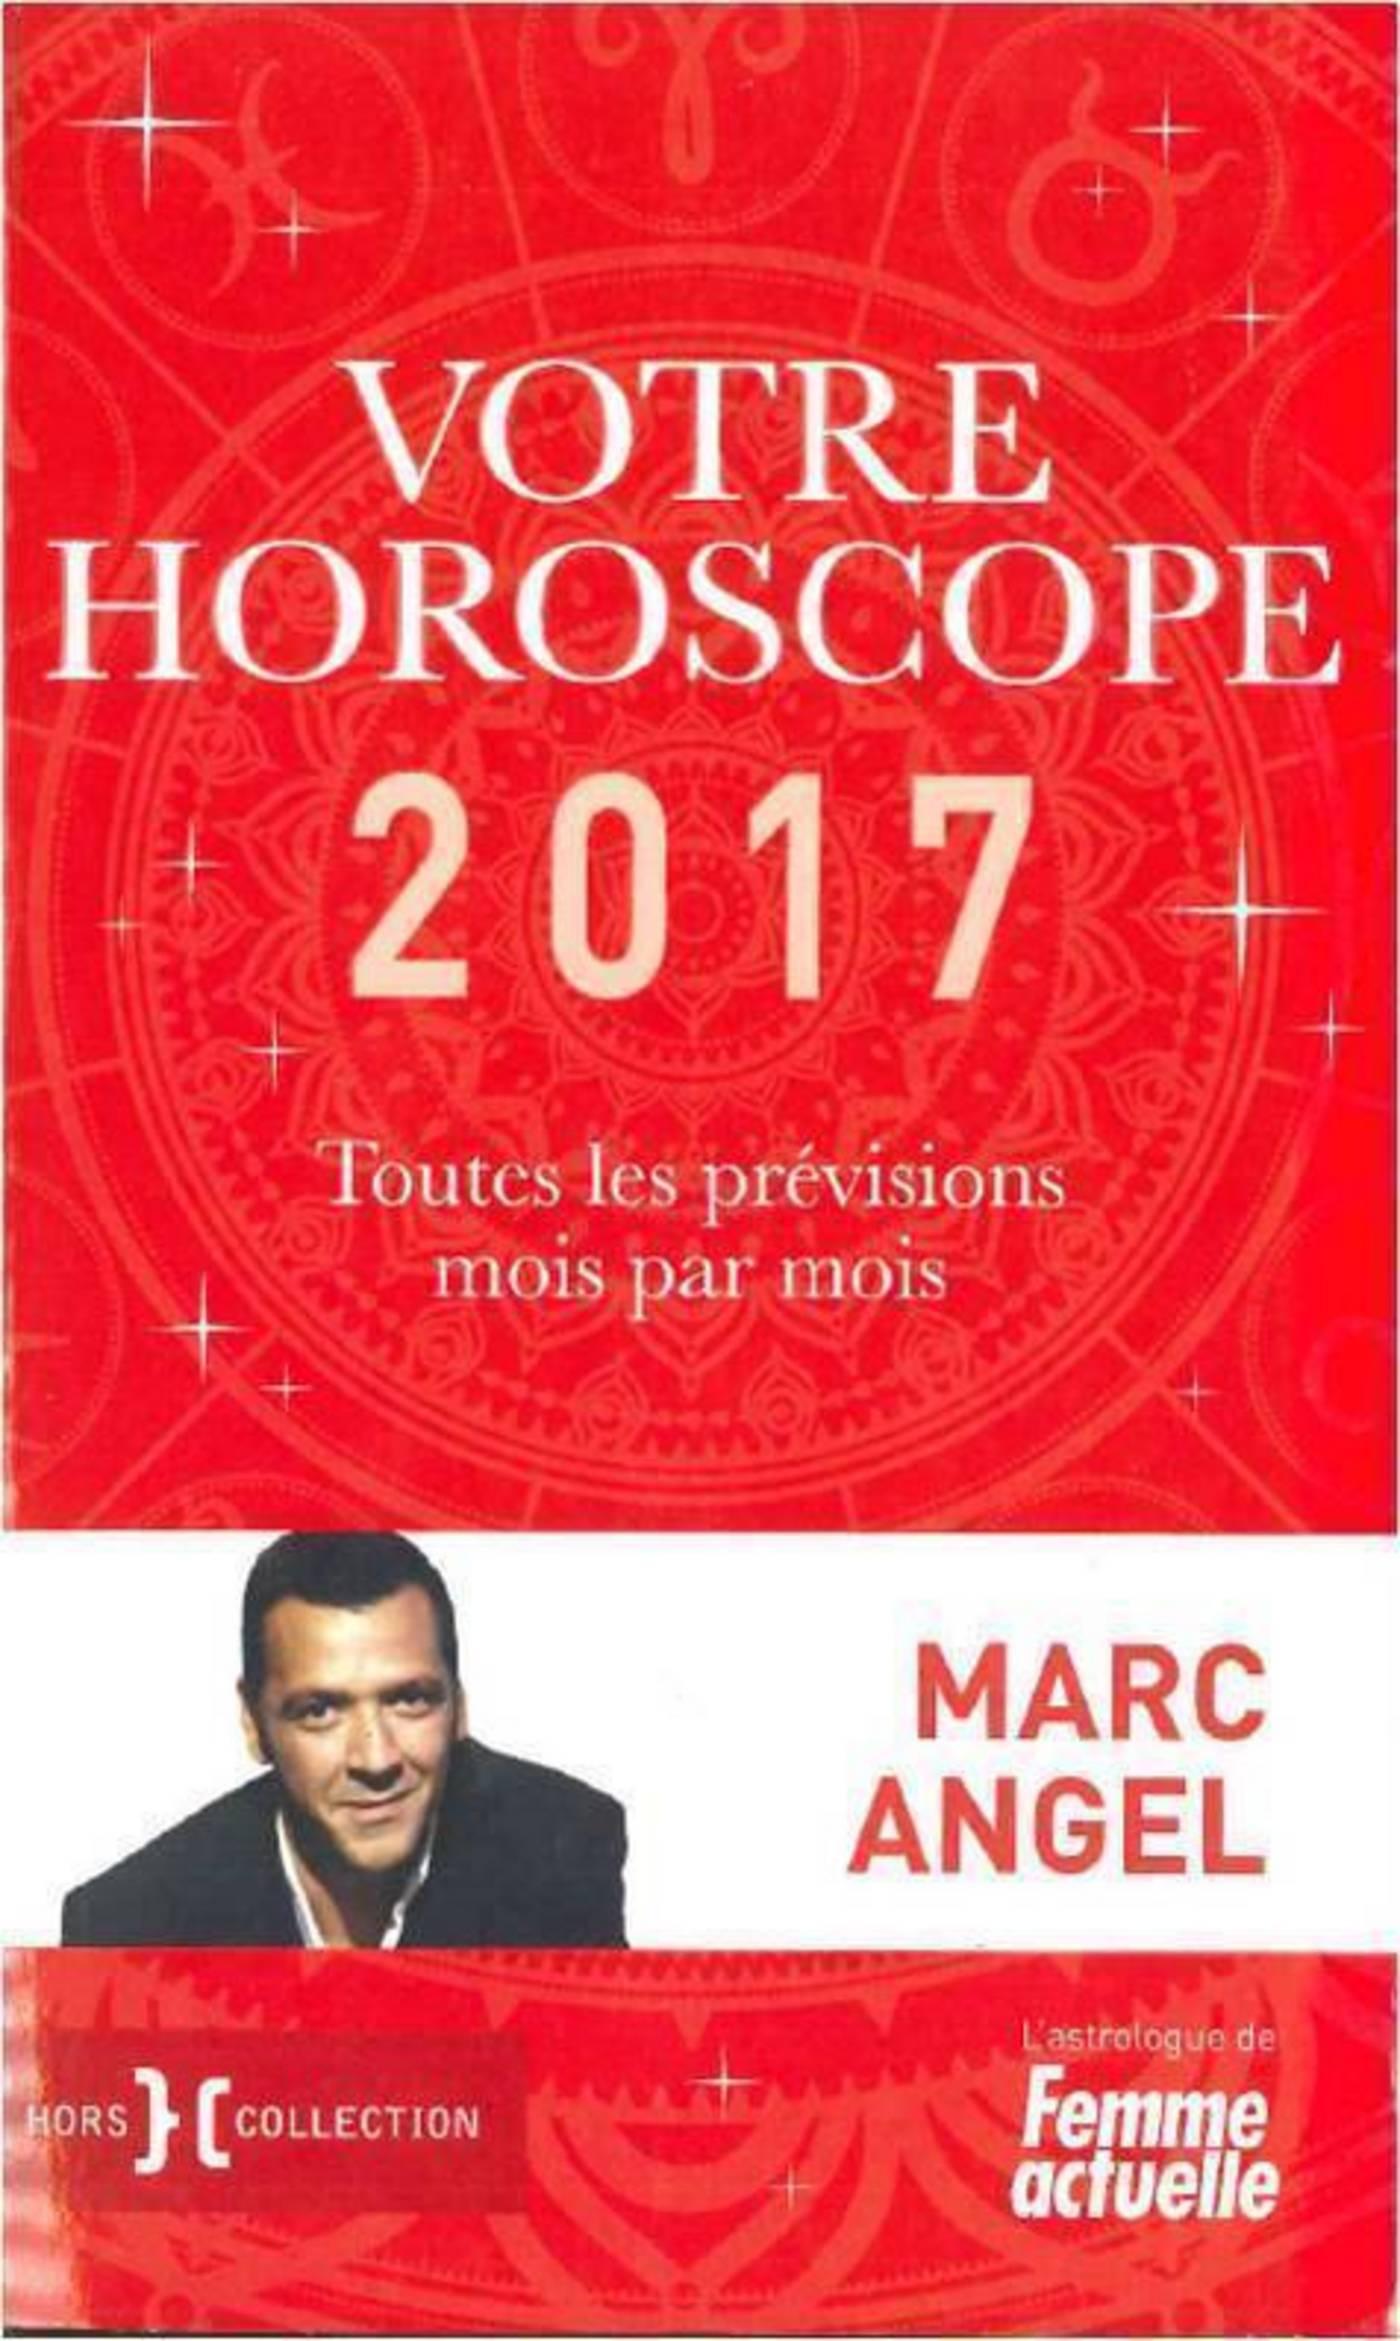 Votre horoscope 2017